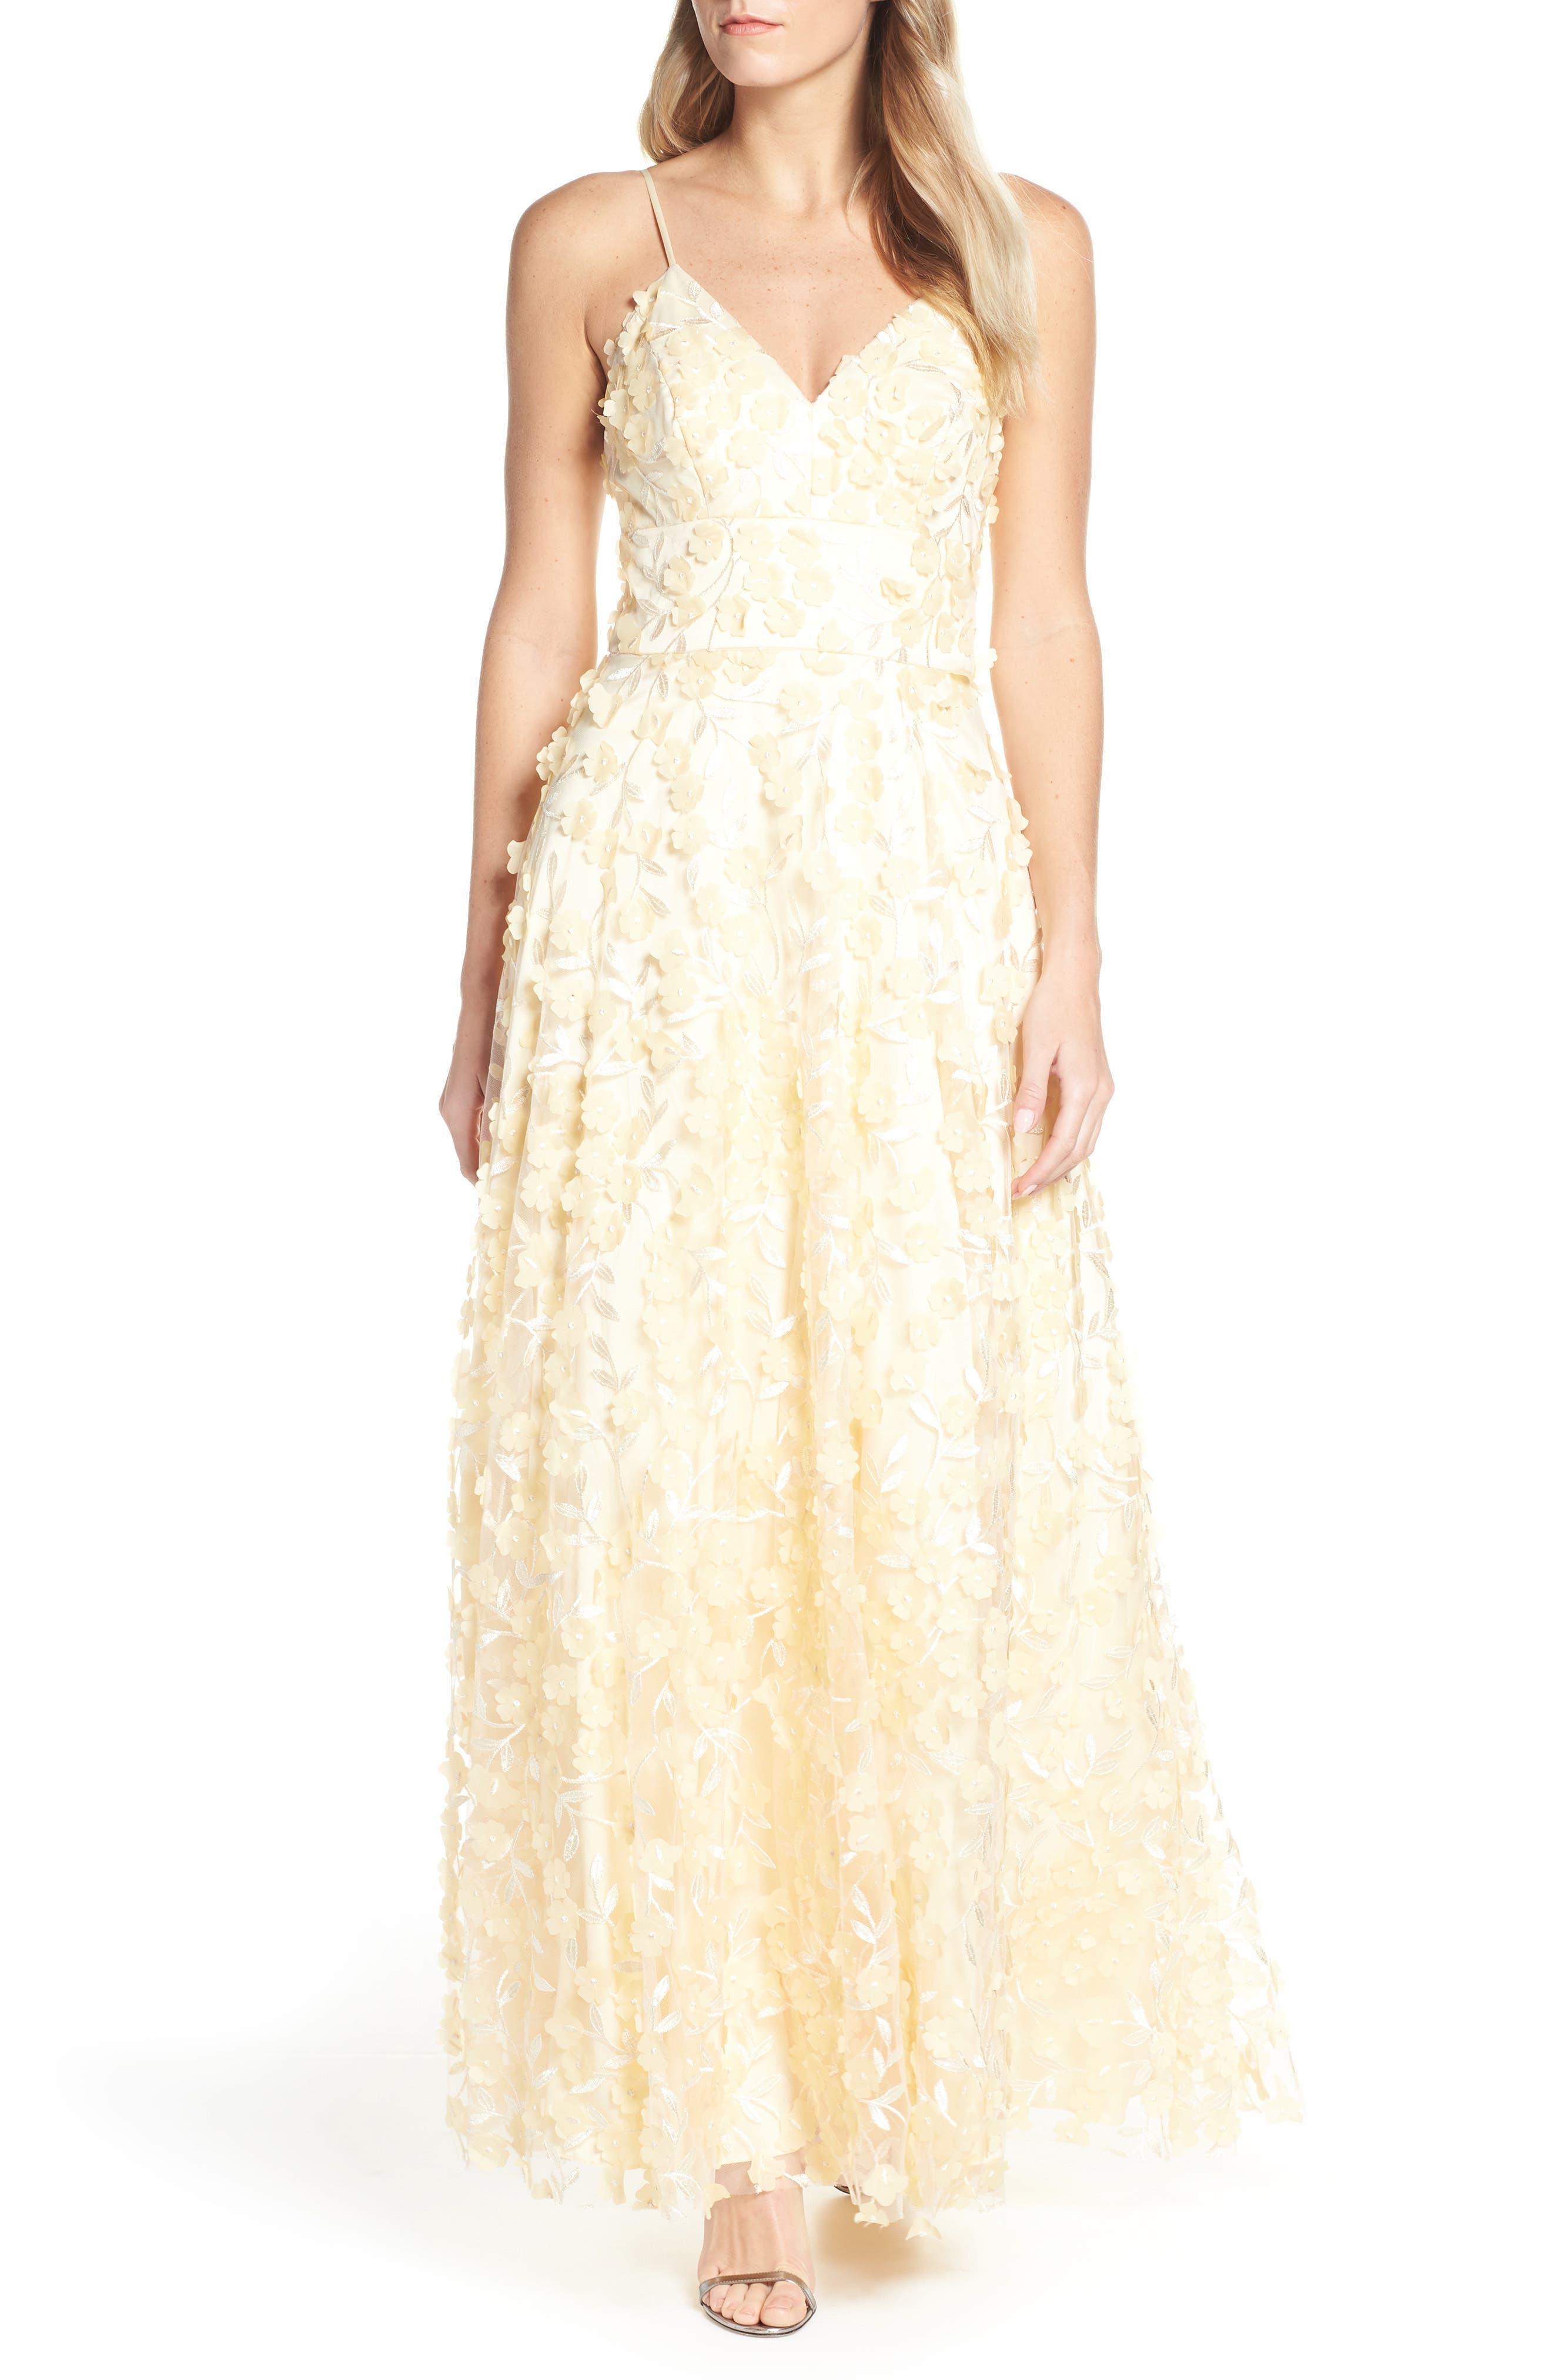 Eliza J Floral Applique Evening Dress, Yellow